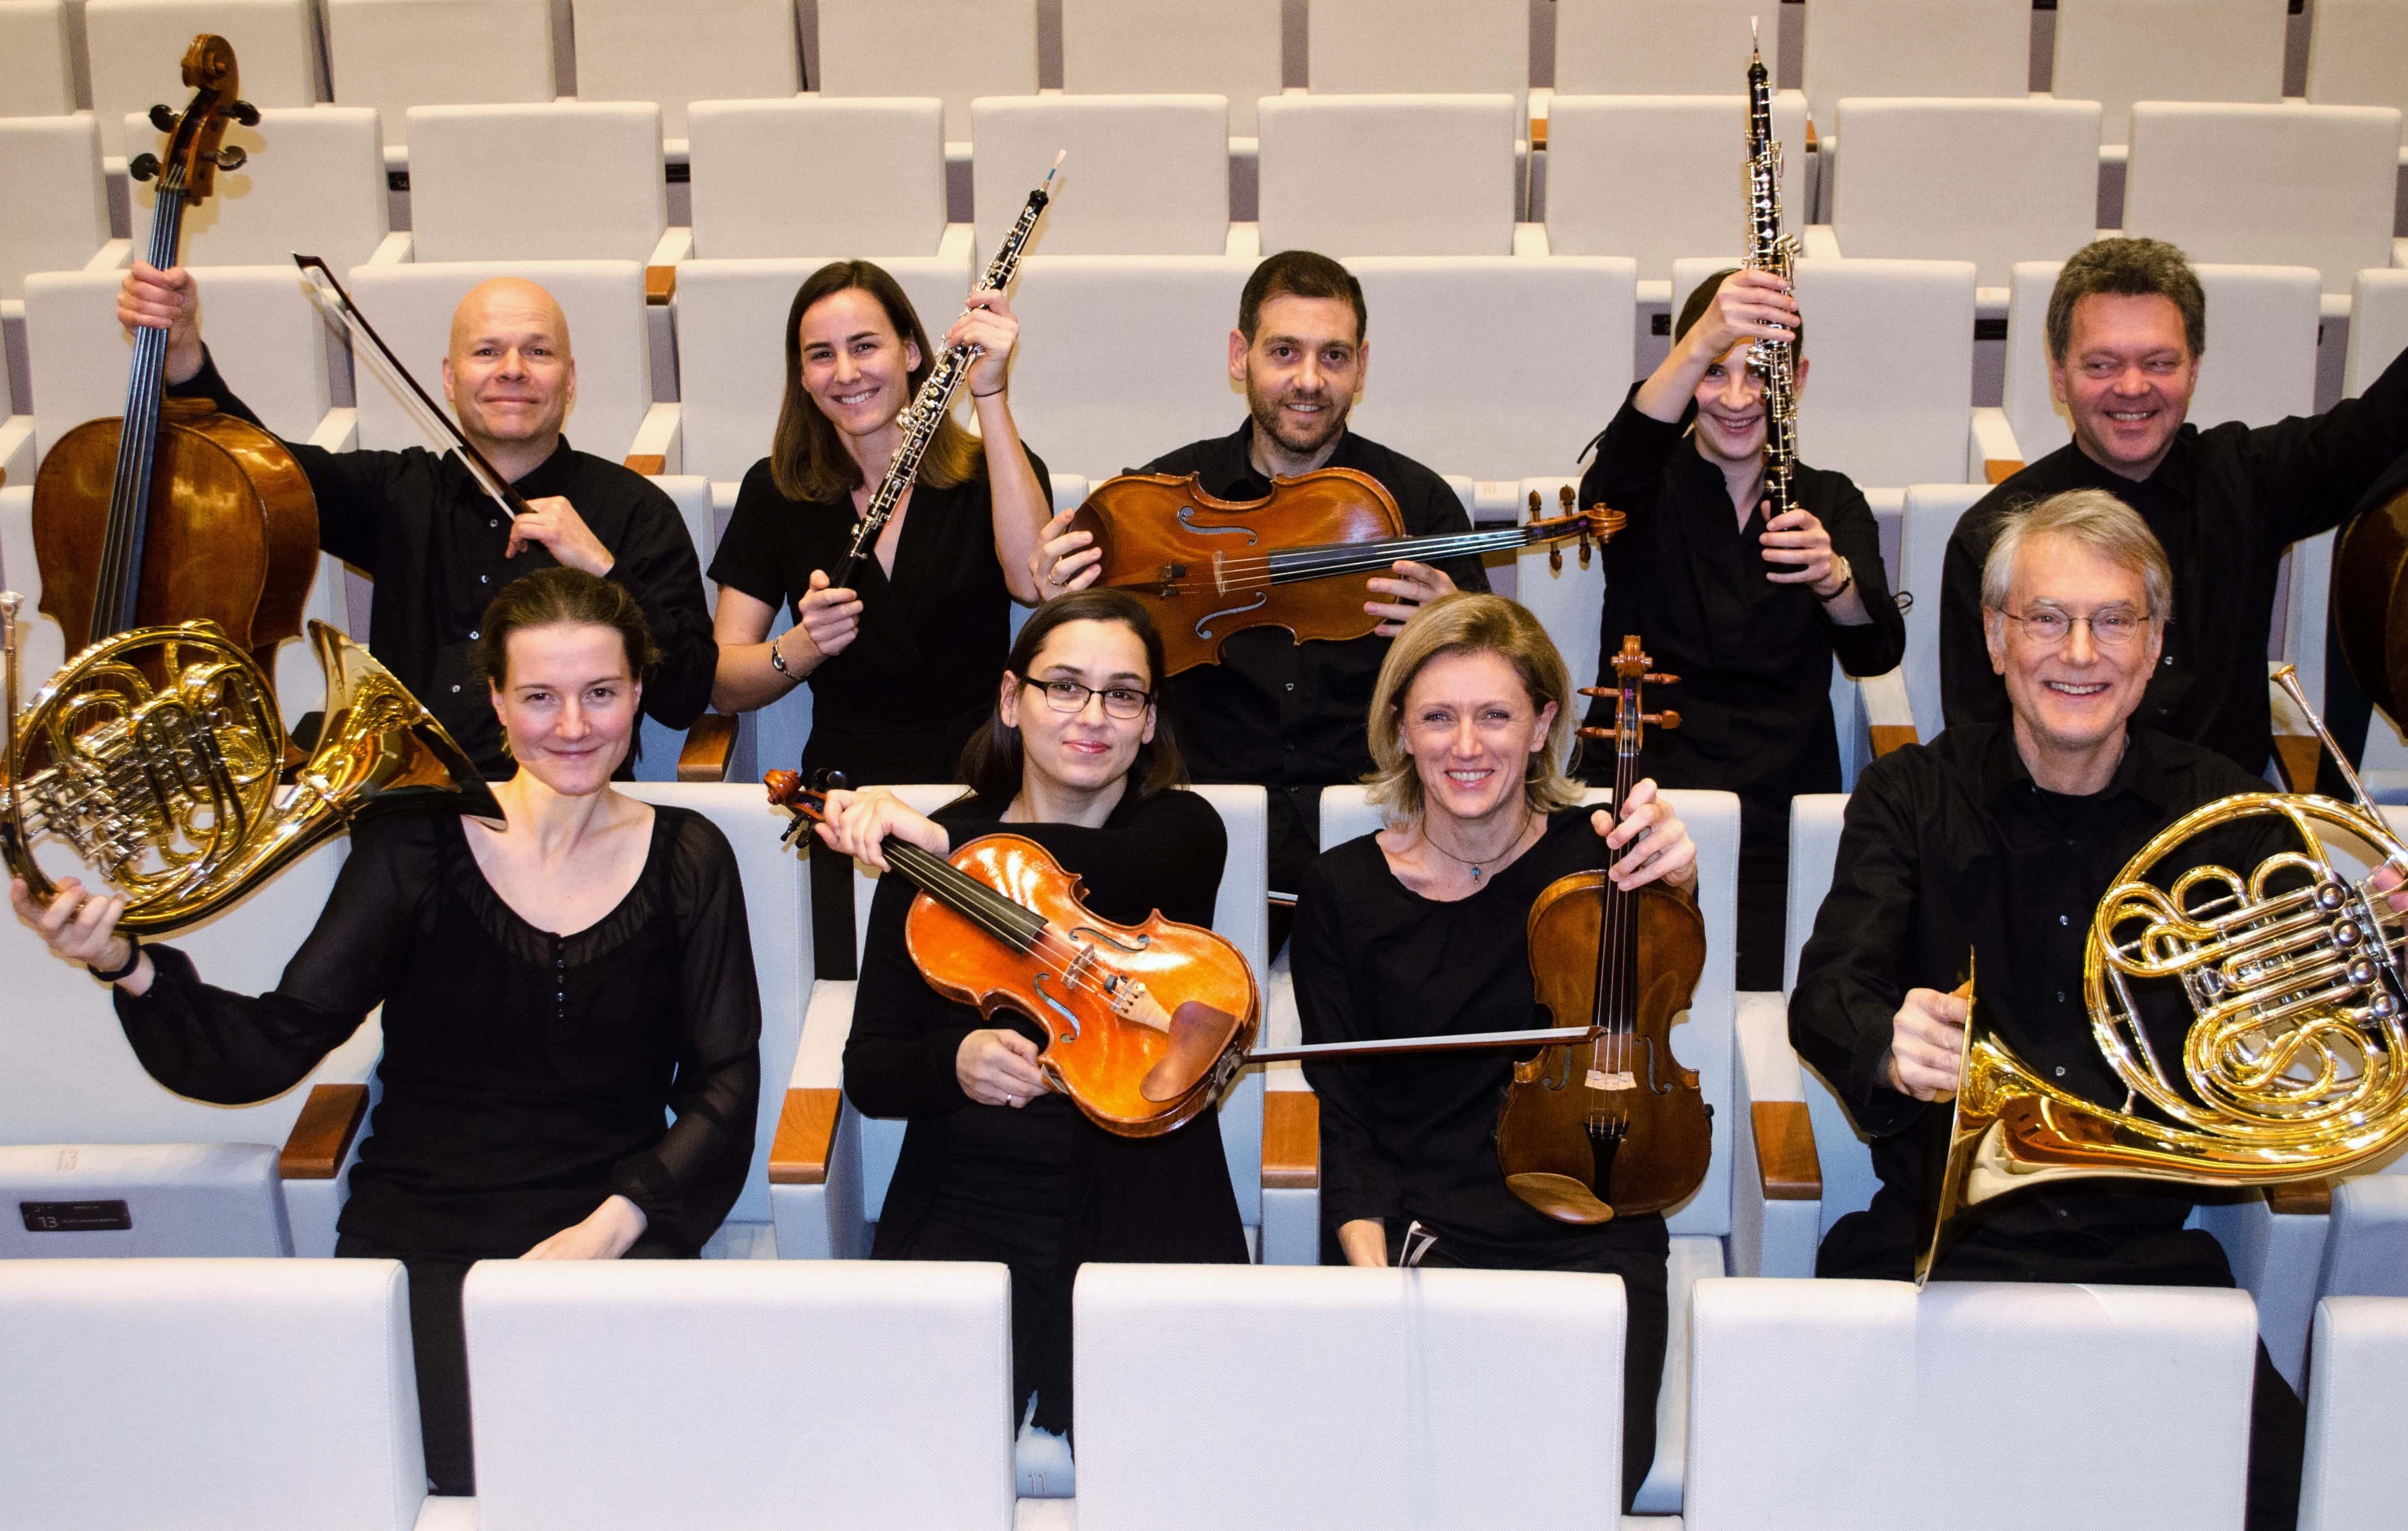 Amadé (Bochumer Symphoniker) treten im Bierkulturgarten auf